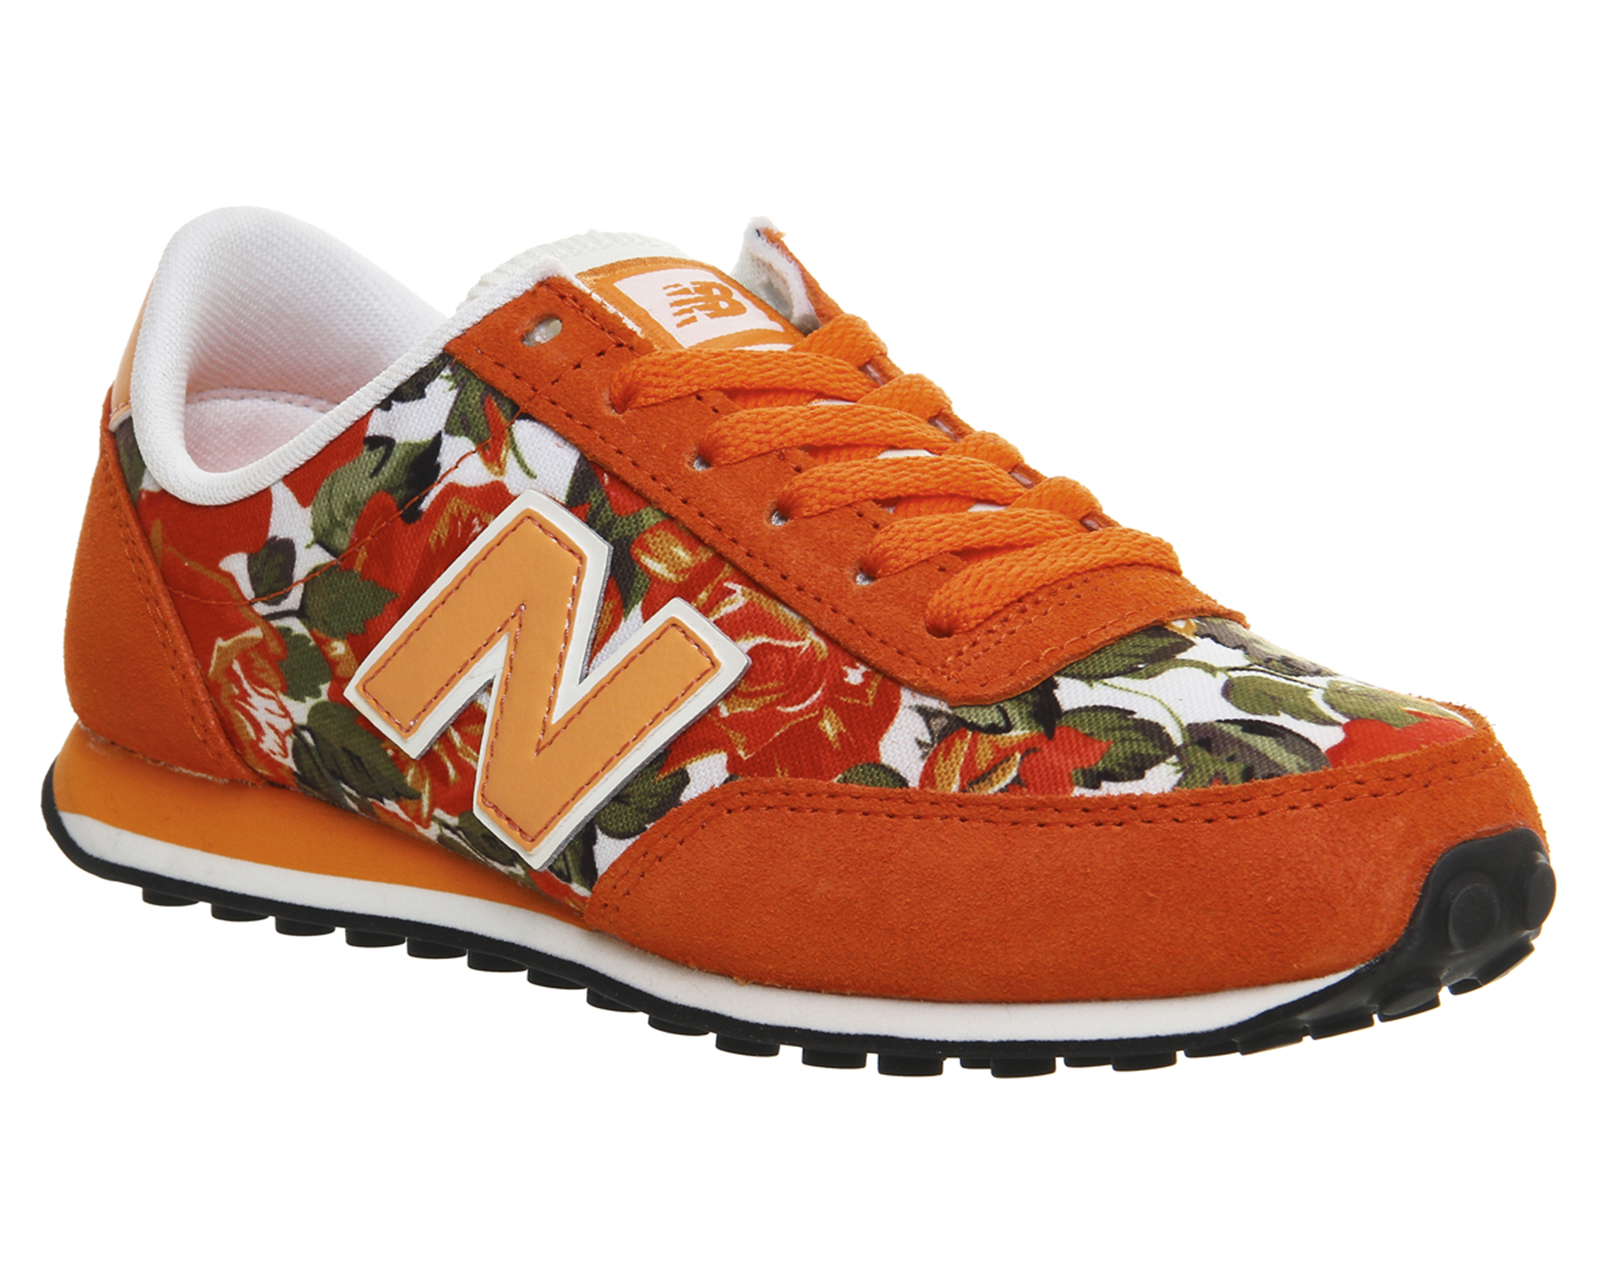 mens new balance 410 orange floral st trainers shoes. Black Bedroom Furniture Sets. Home Design Ideas